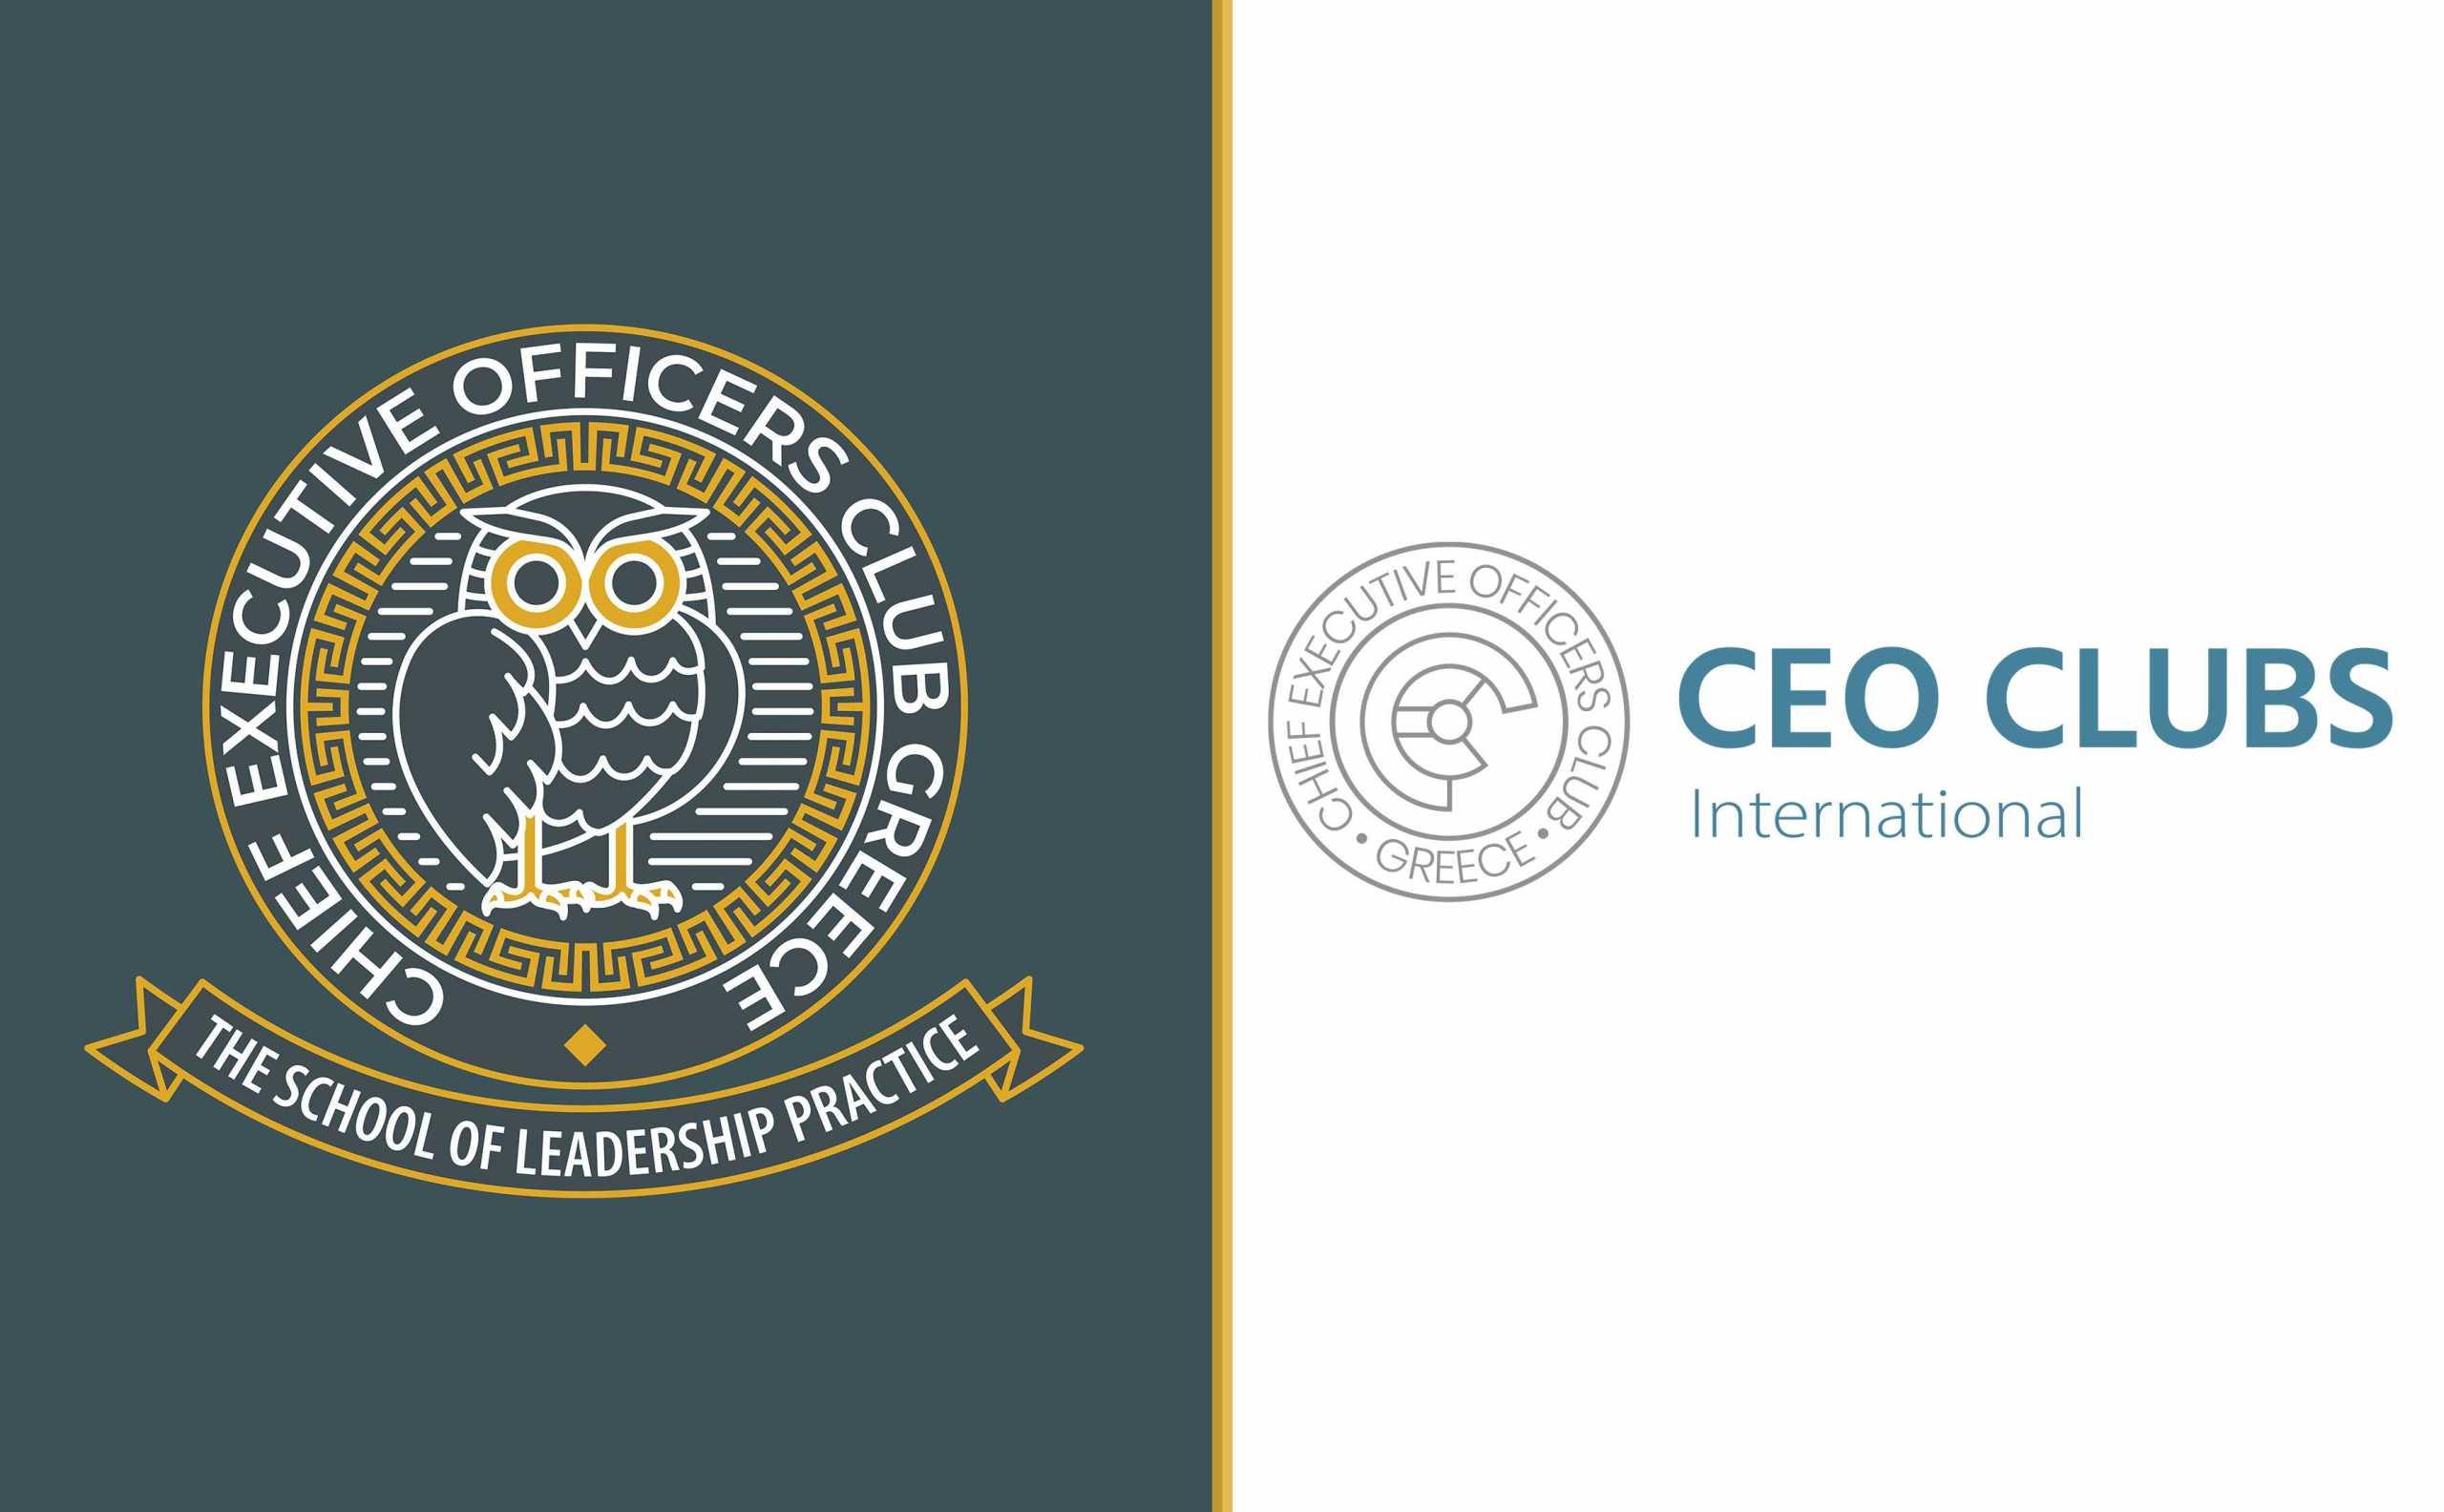 School of Leadership Practice: H νέα καινοτόμος πρωτοβουλία του CEO Clubs Greece